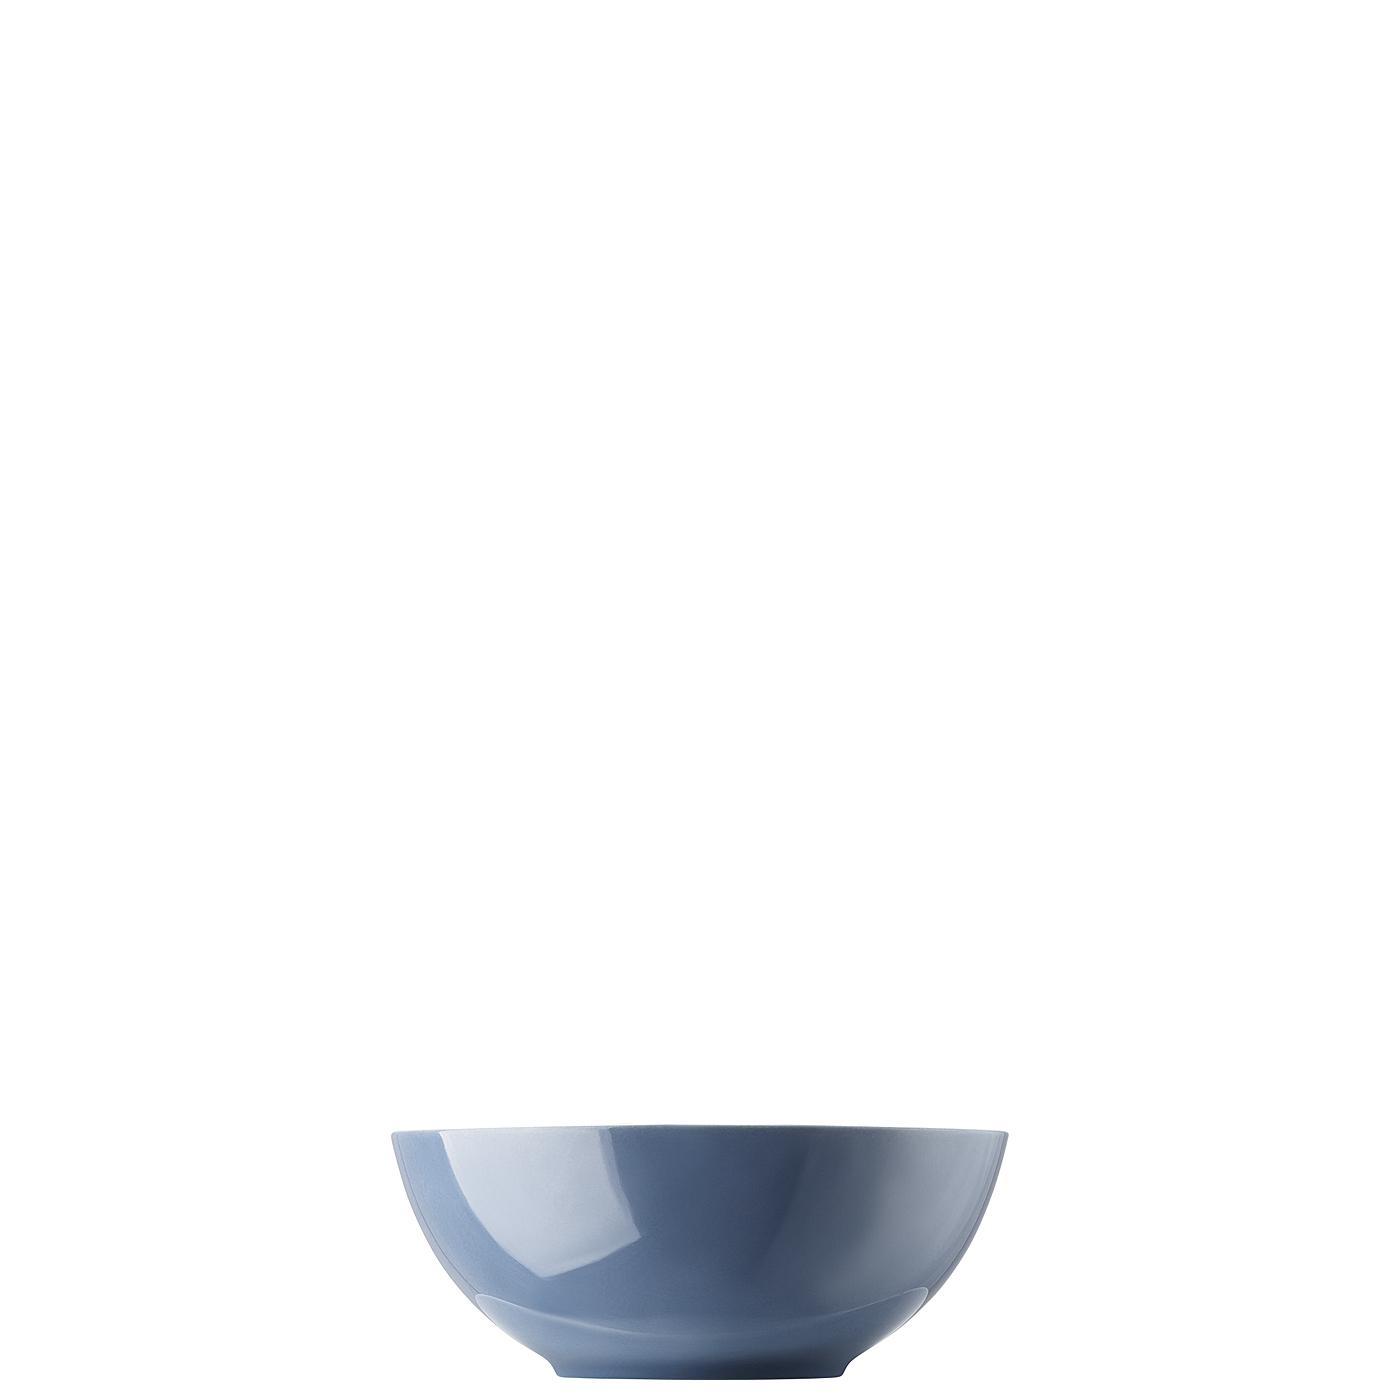 Müslischale 15 cm Sunny Day Nordic Blue Thomas Porzellan